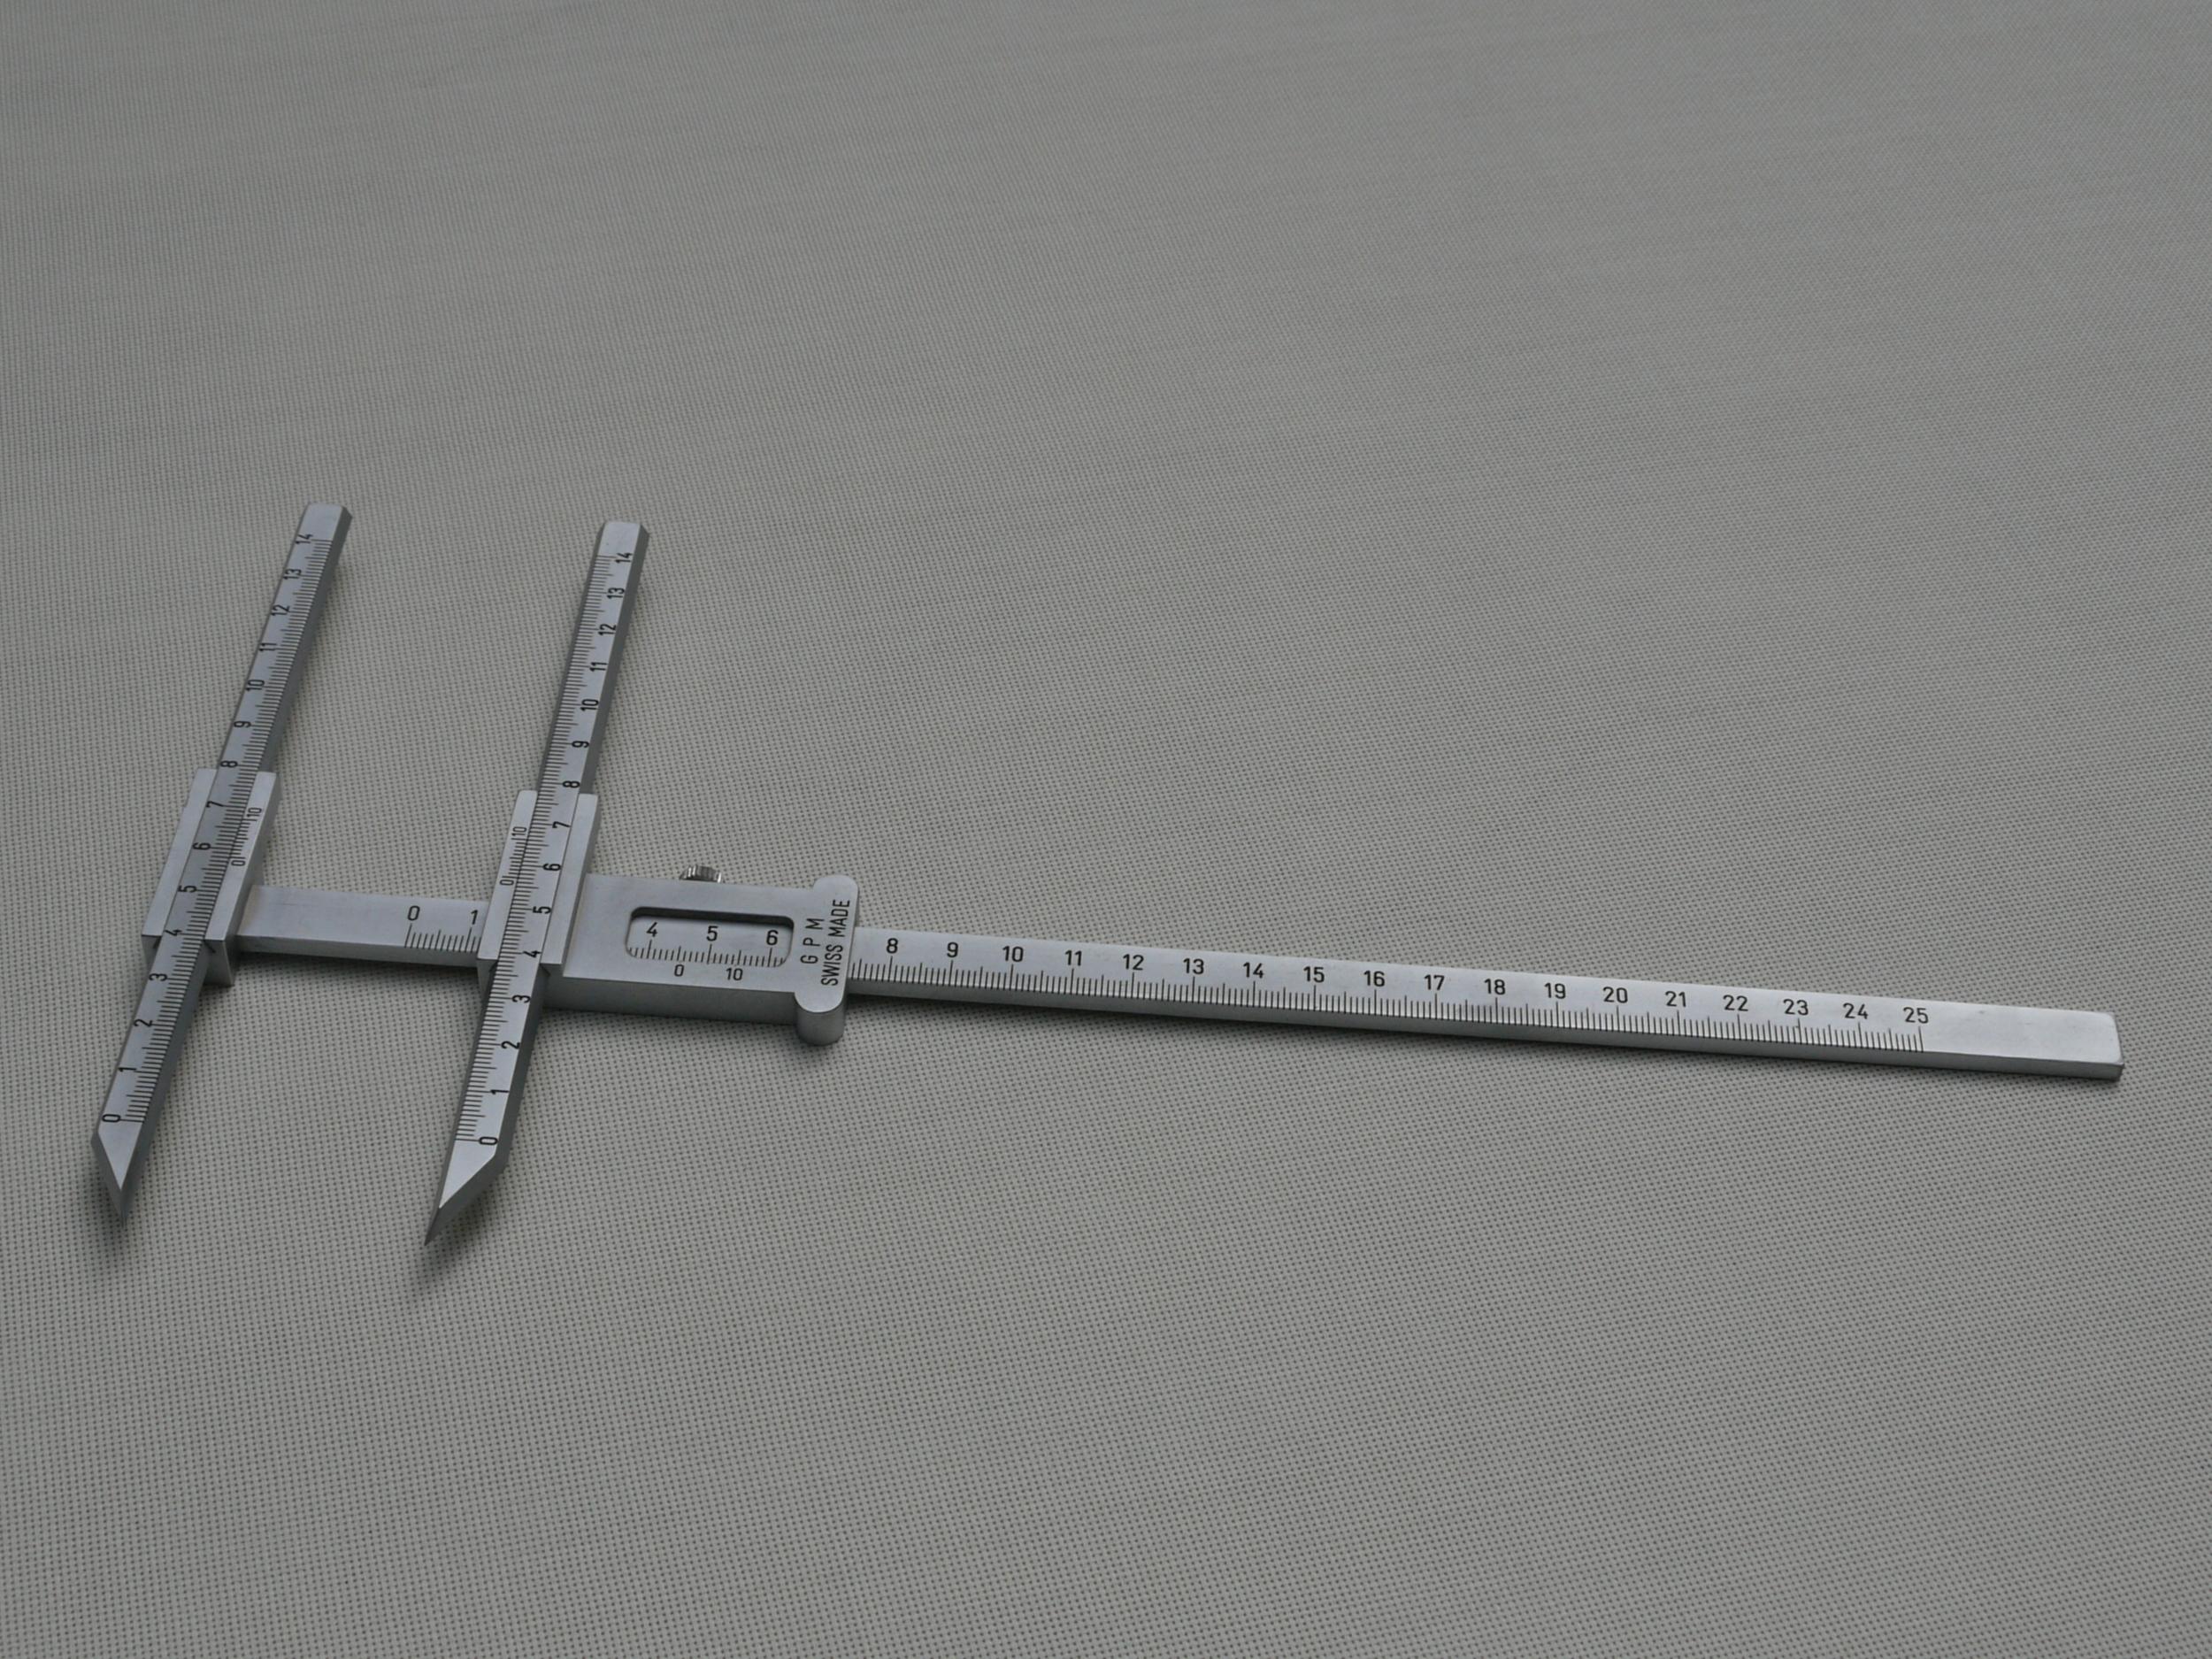 GPM Sliding Caliper, Poech type Model 114